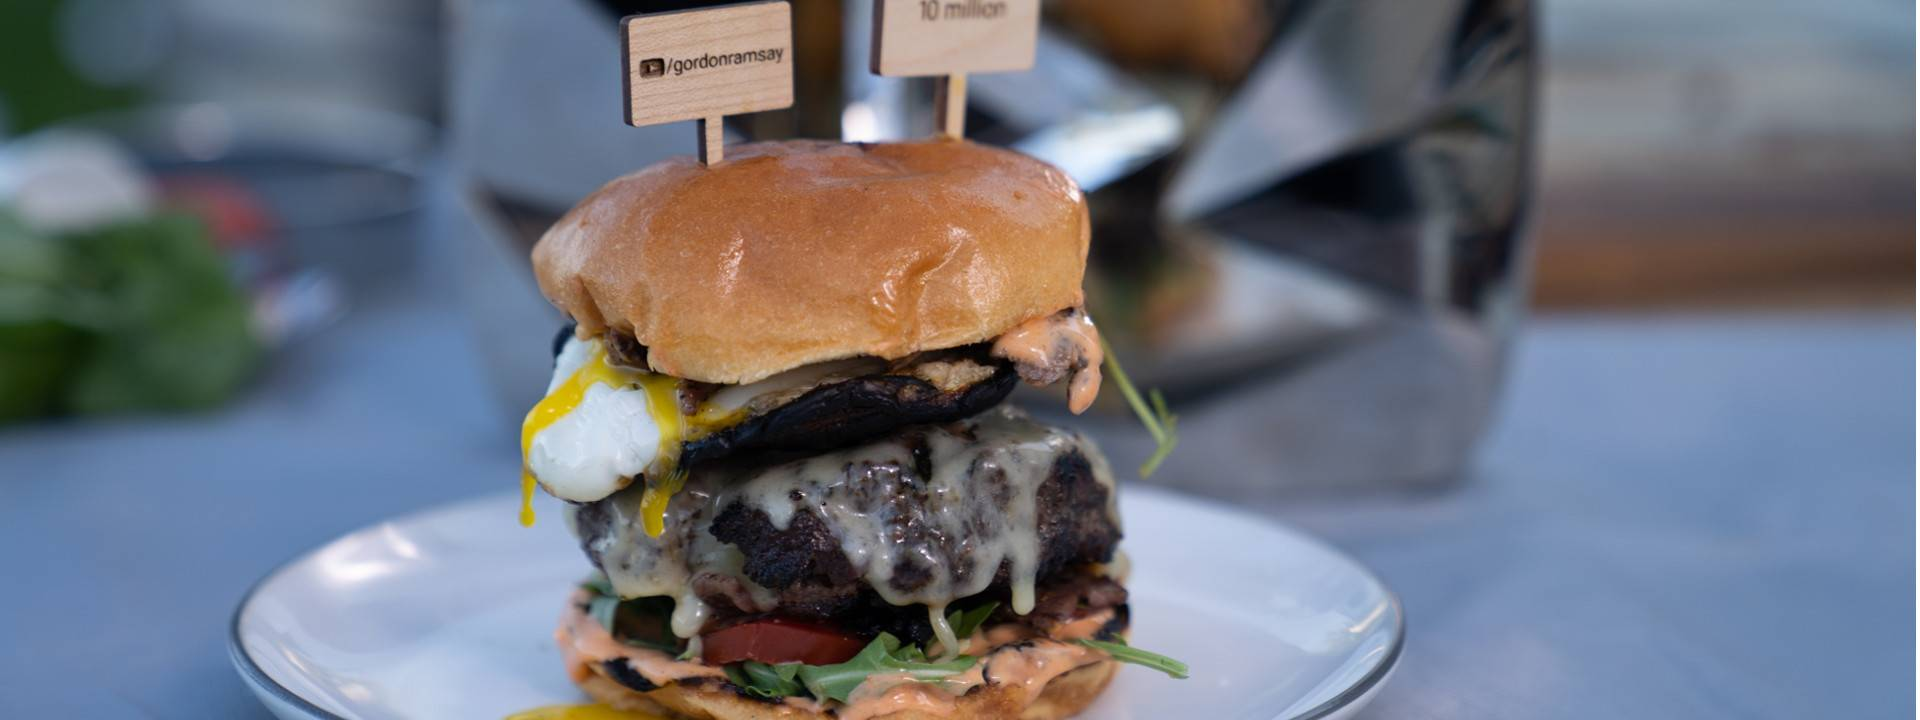 Ricetta Hamburger Ramsey.Gordon Ramsay Celebration Burger Recipe 10 Million Subscribers